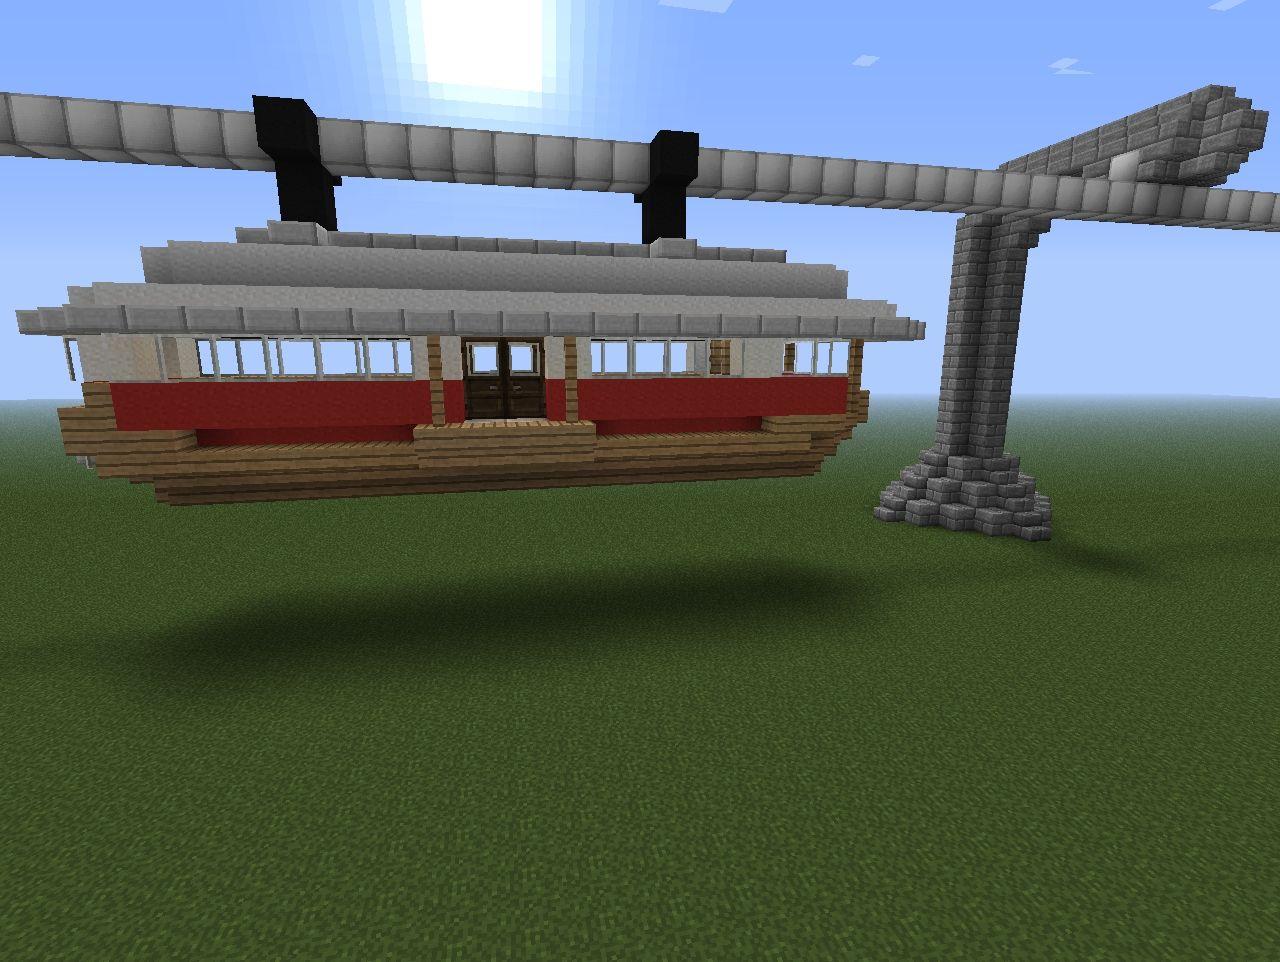 Monorail Design #1 Minecraft Project